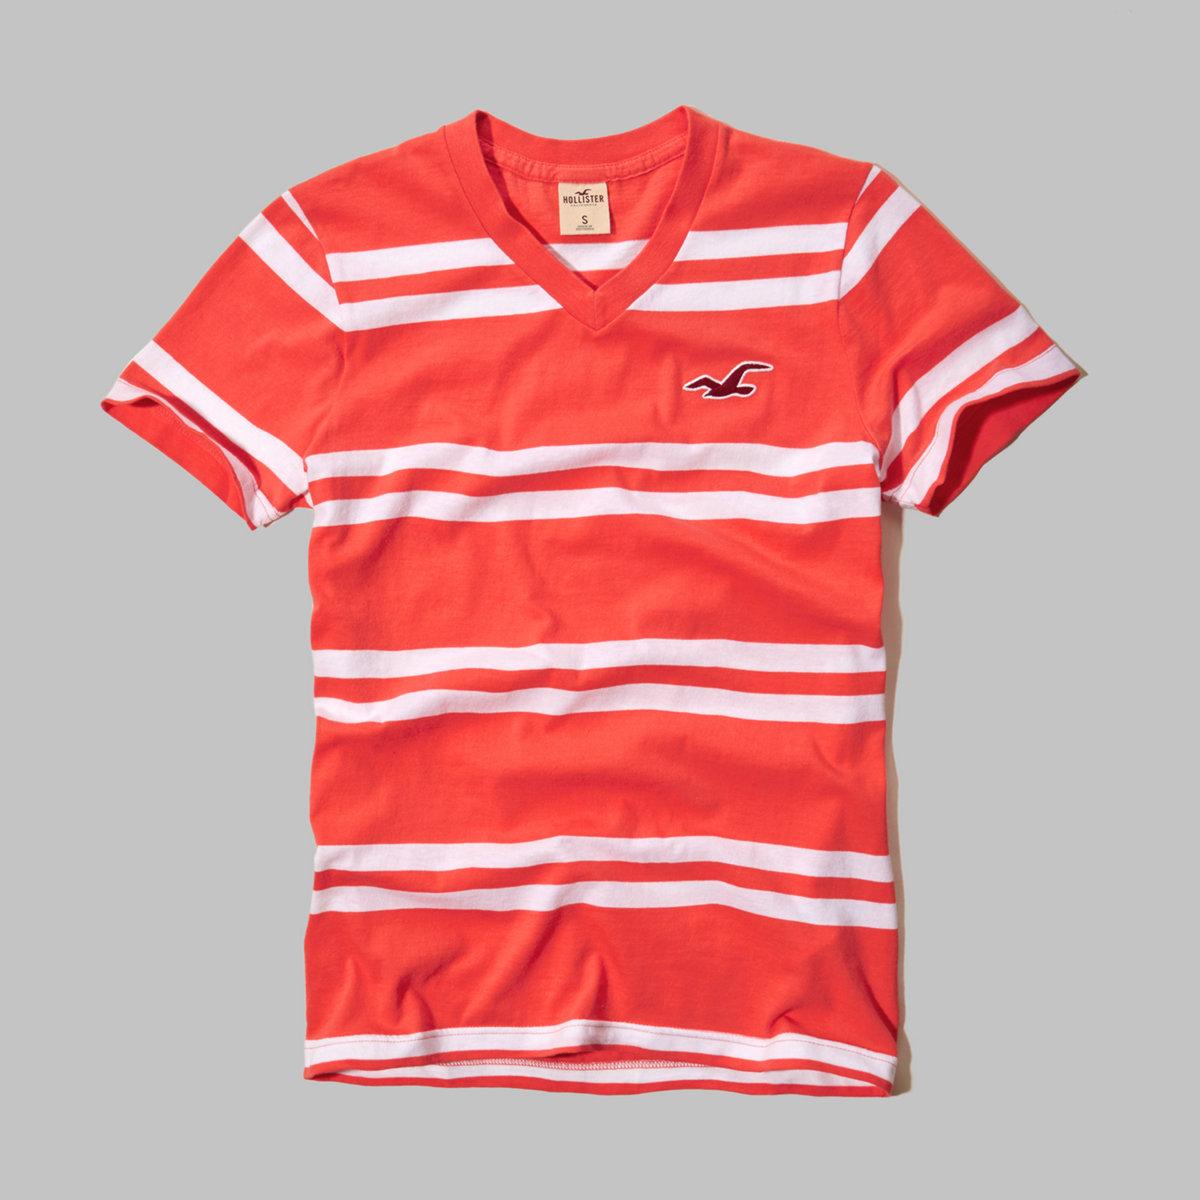 Swami's Beach V Neck T-Shirt